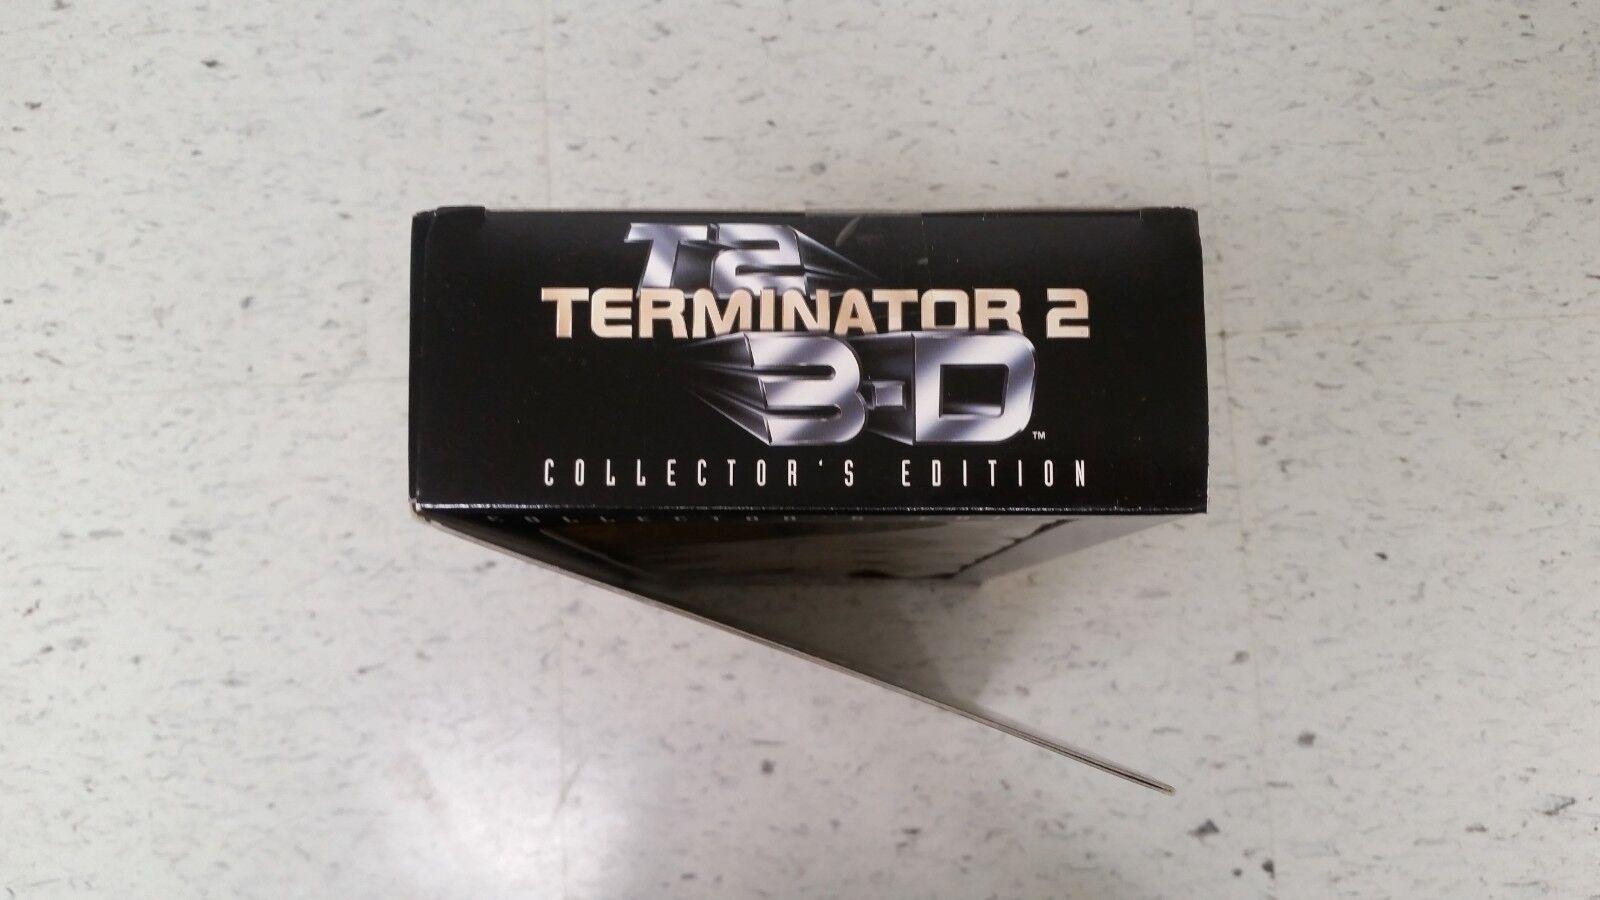 TERMINATOR 2 3-D 1-800 TERMINATOR   ITEM ITEM ITEM 800305-R5 4a0b82